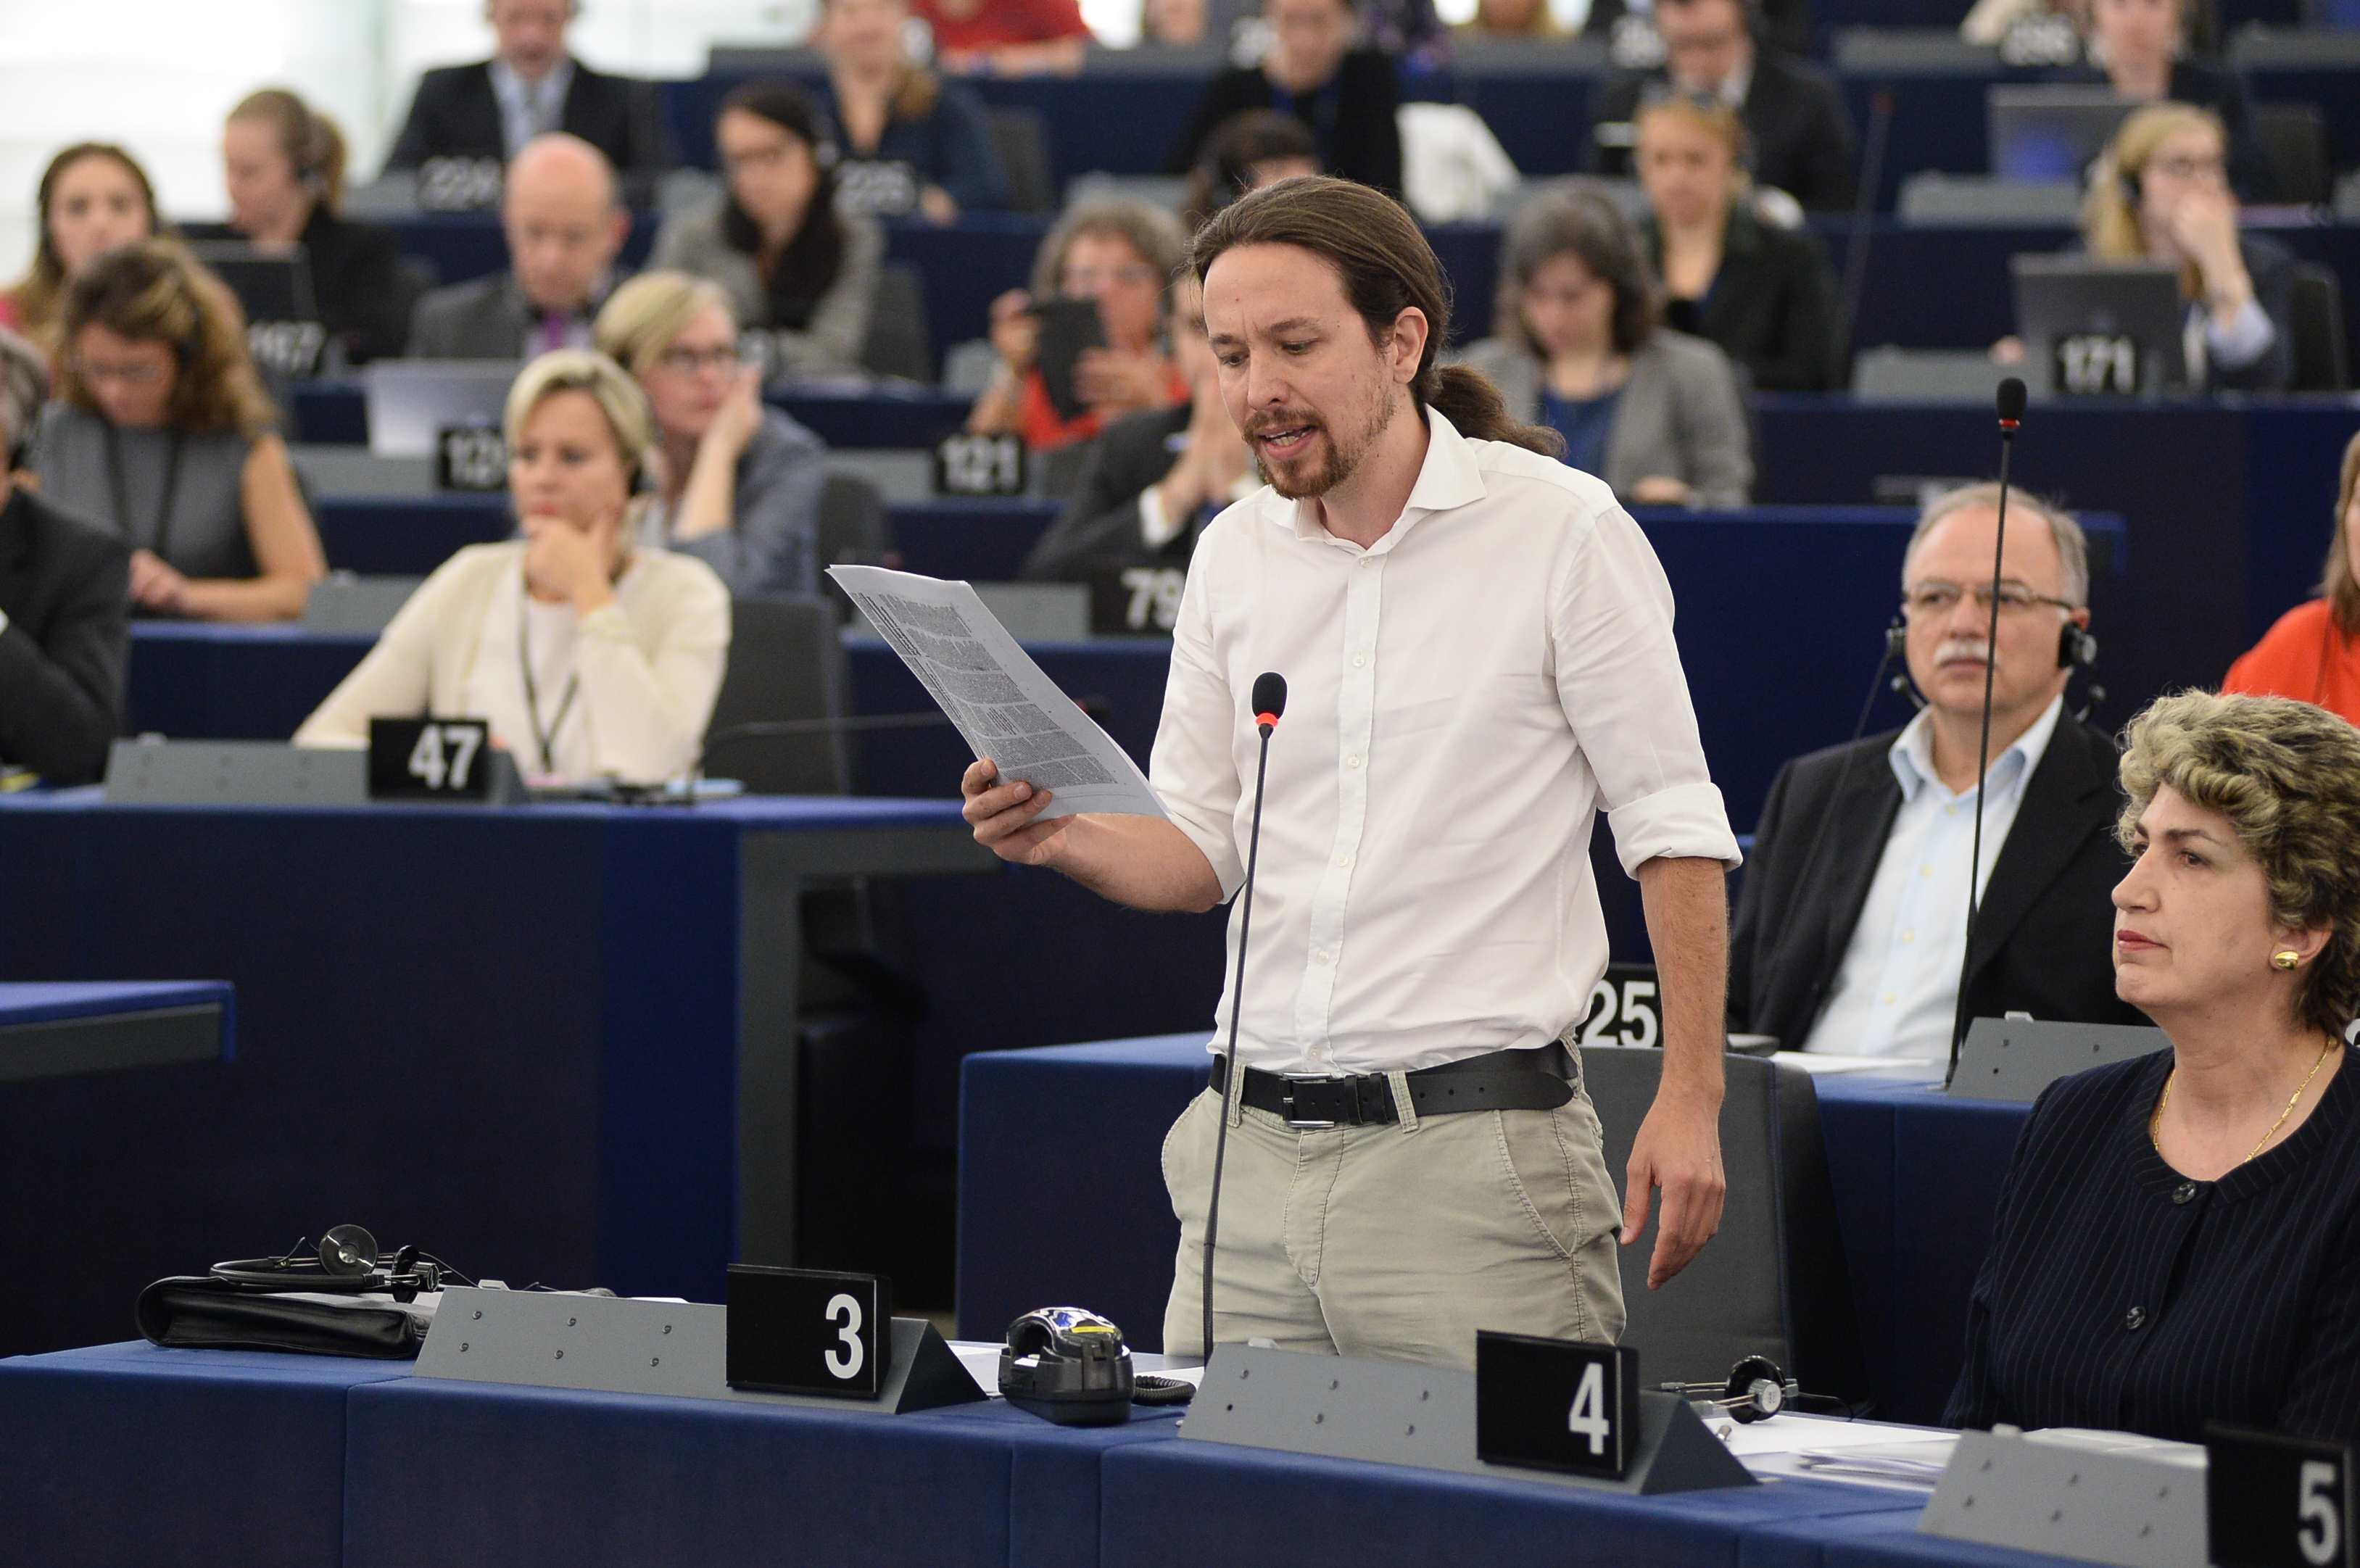 L'eurodiputat Pablo Iglesias, actualment secretari general de Podemos / PARLAMENT EUROPEU